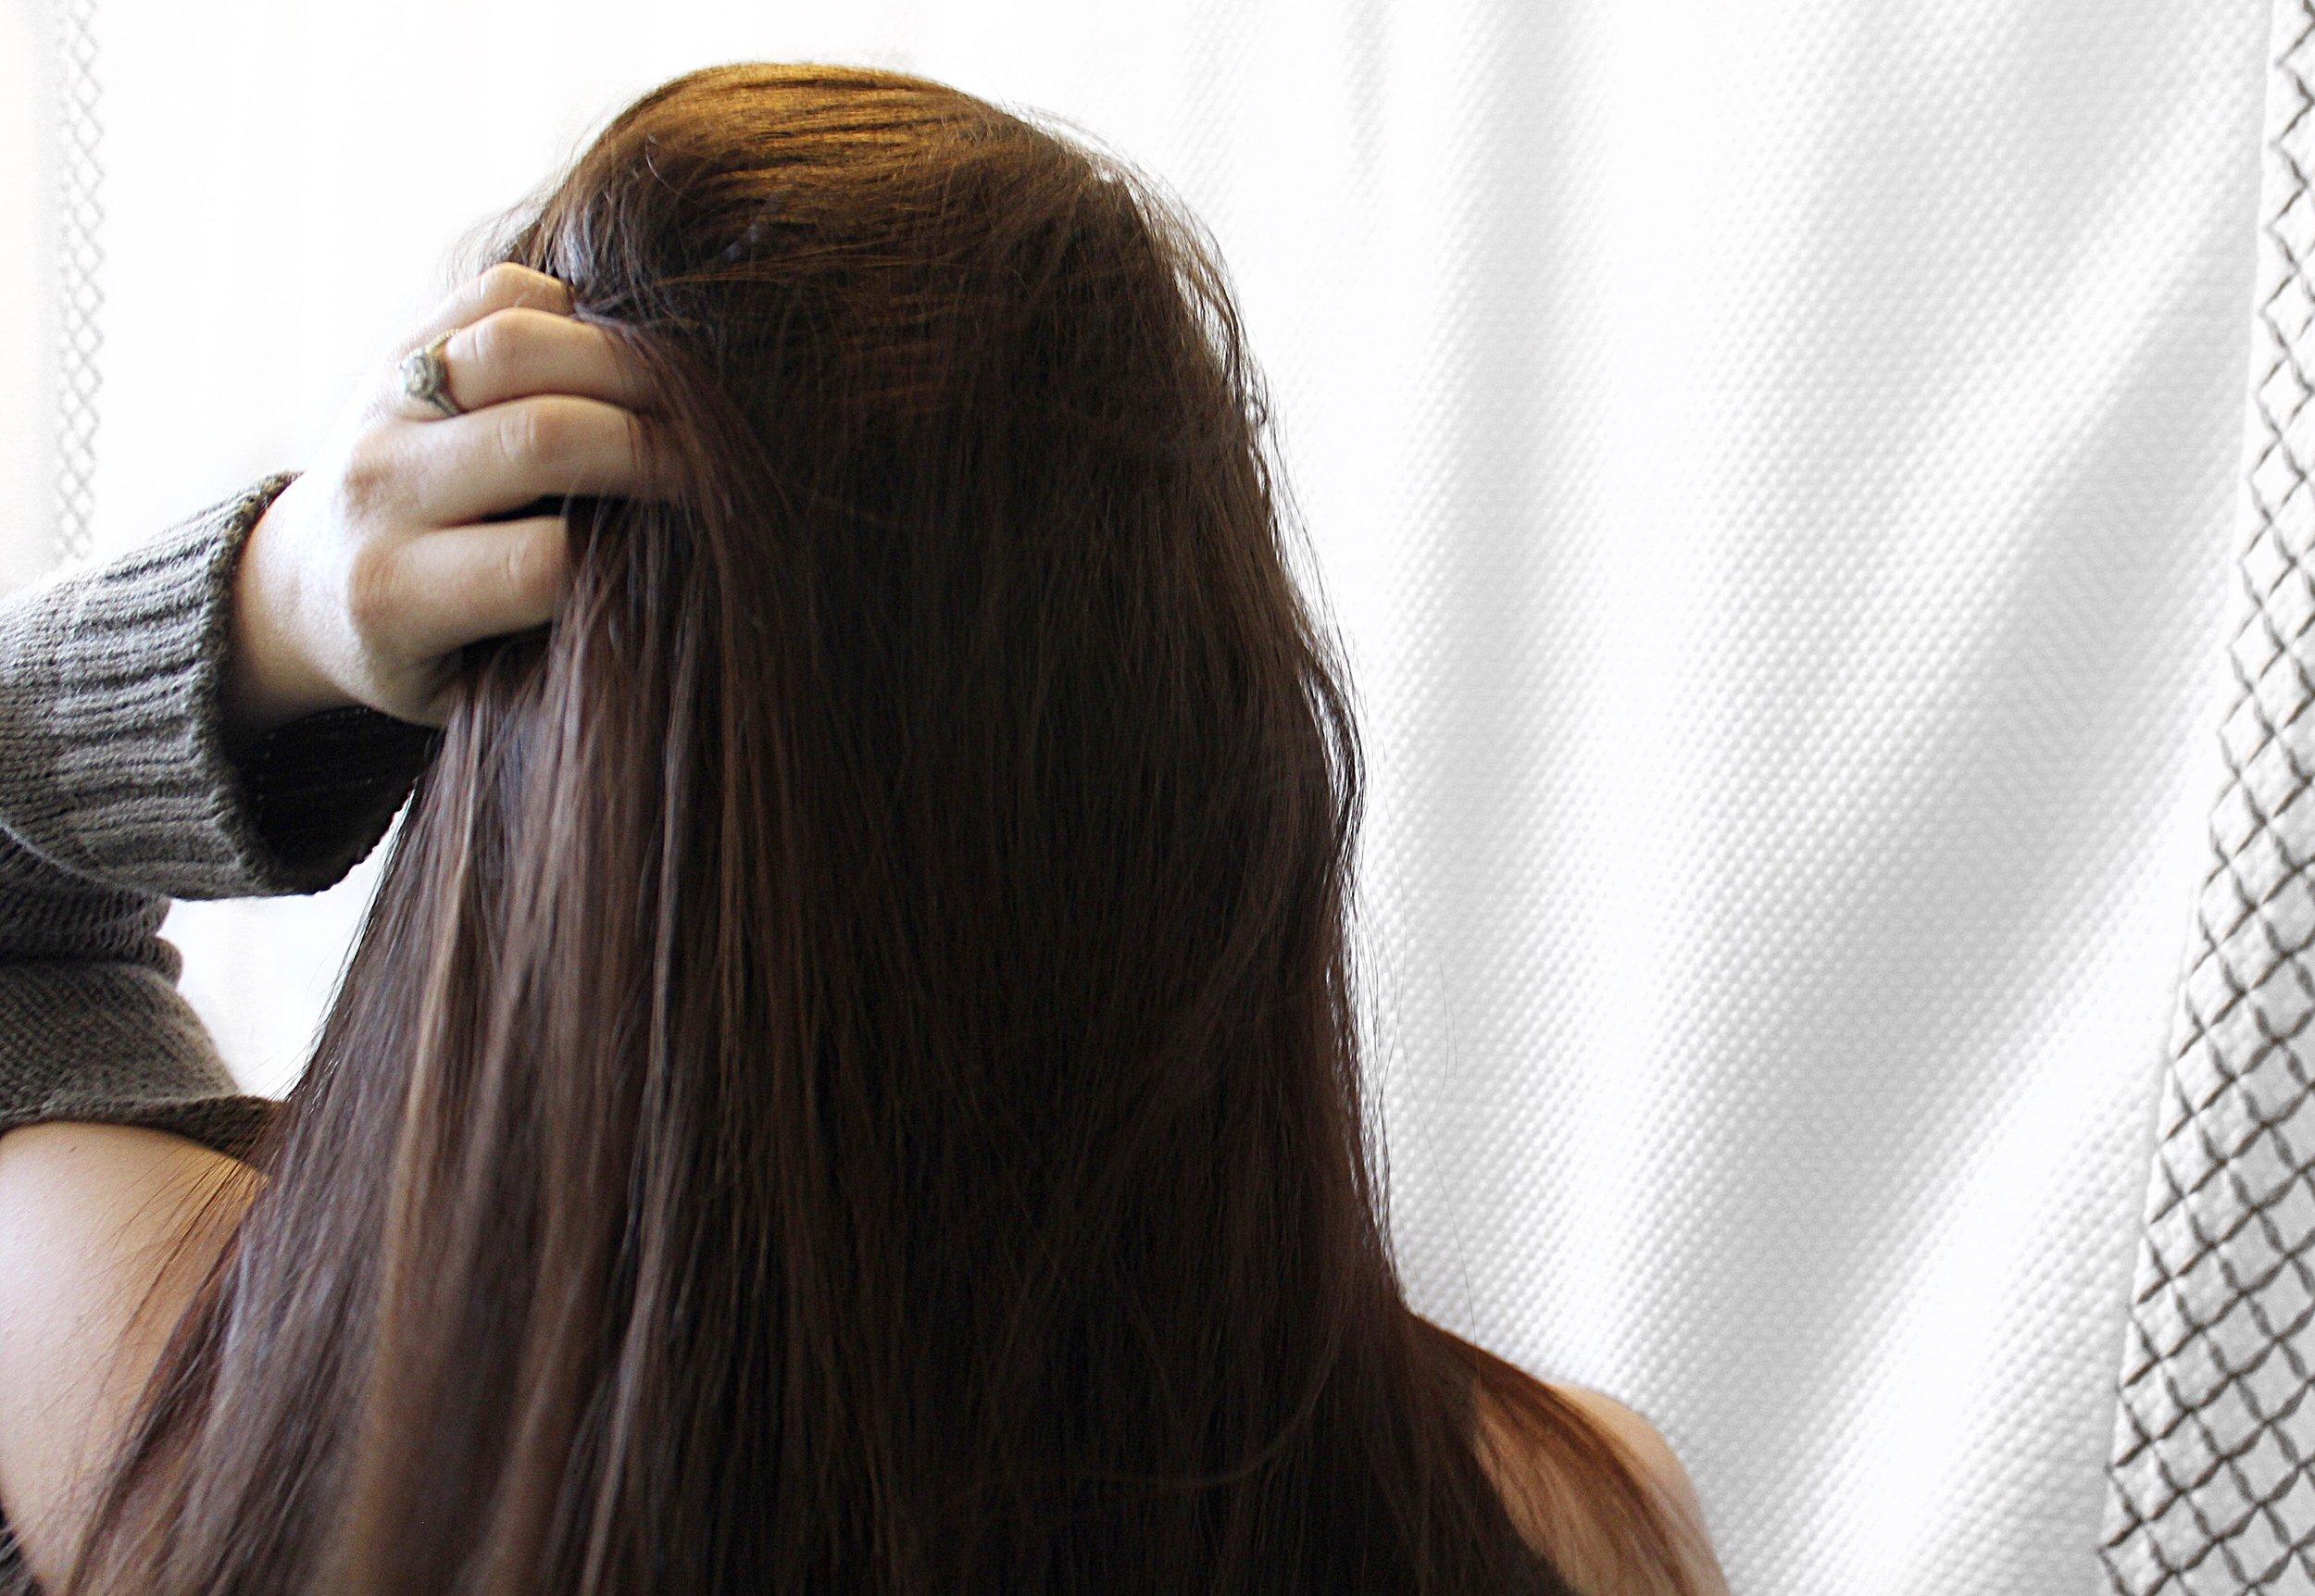 4-day-dirty-hair.JPG